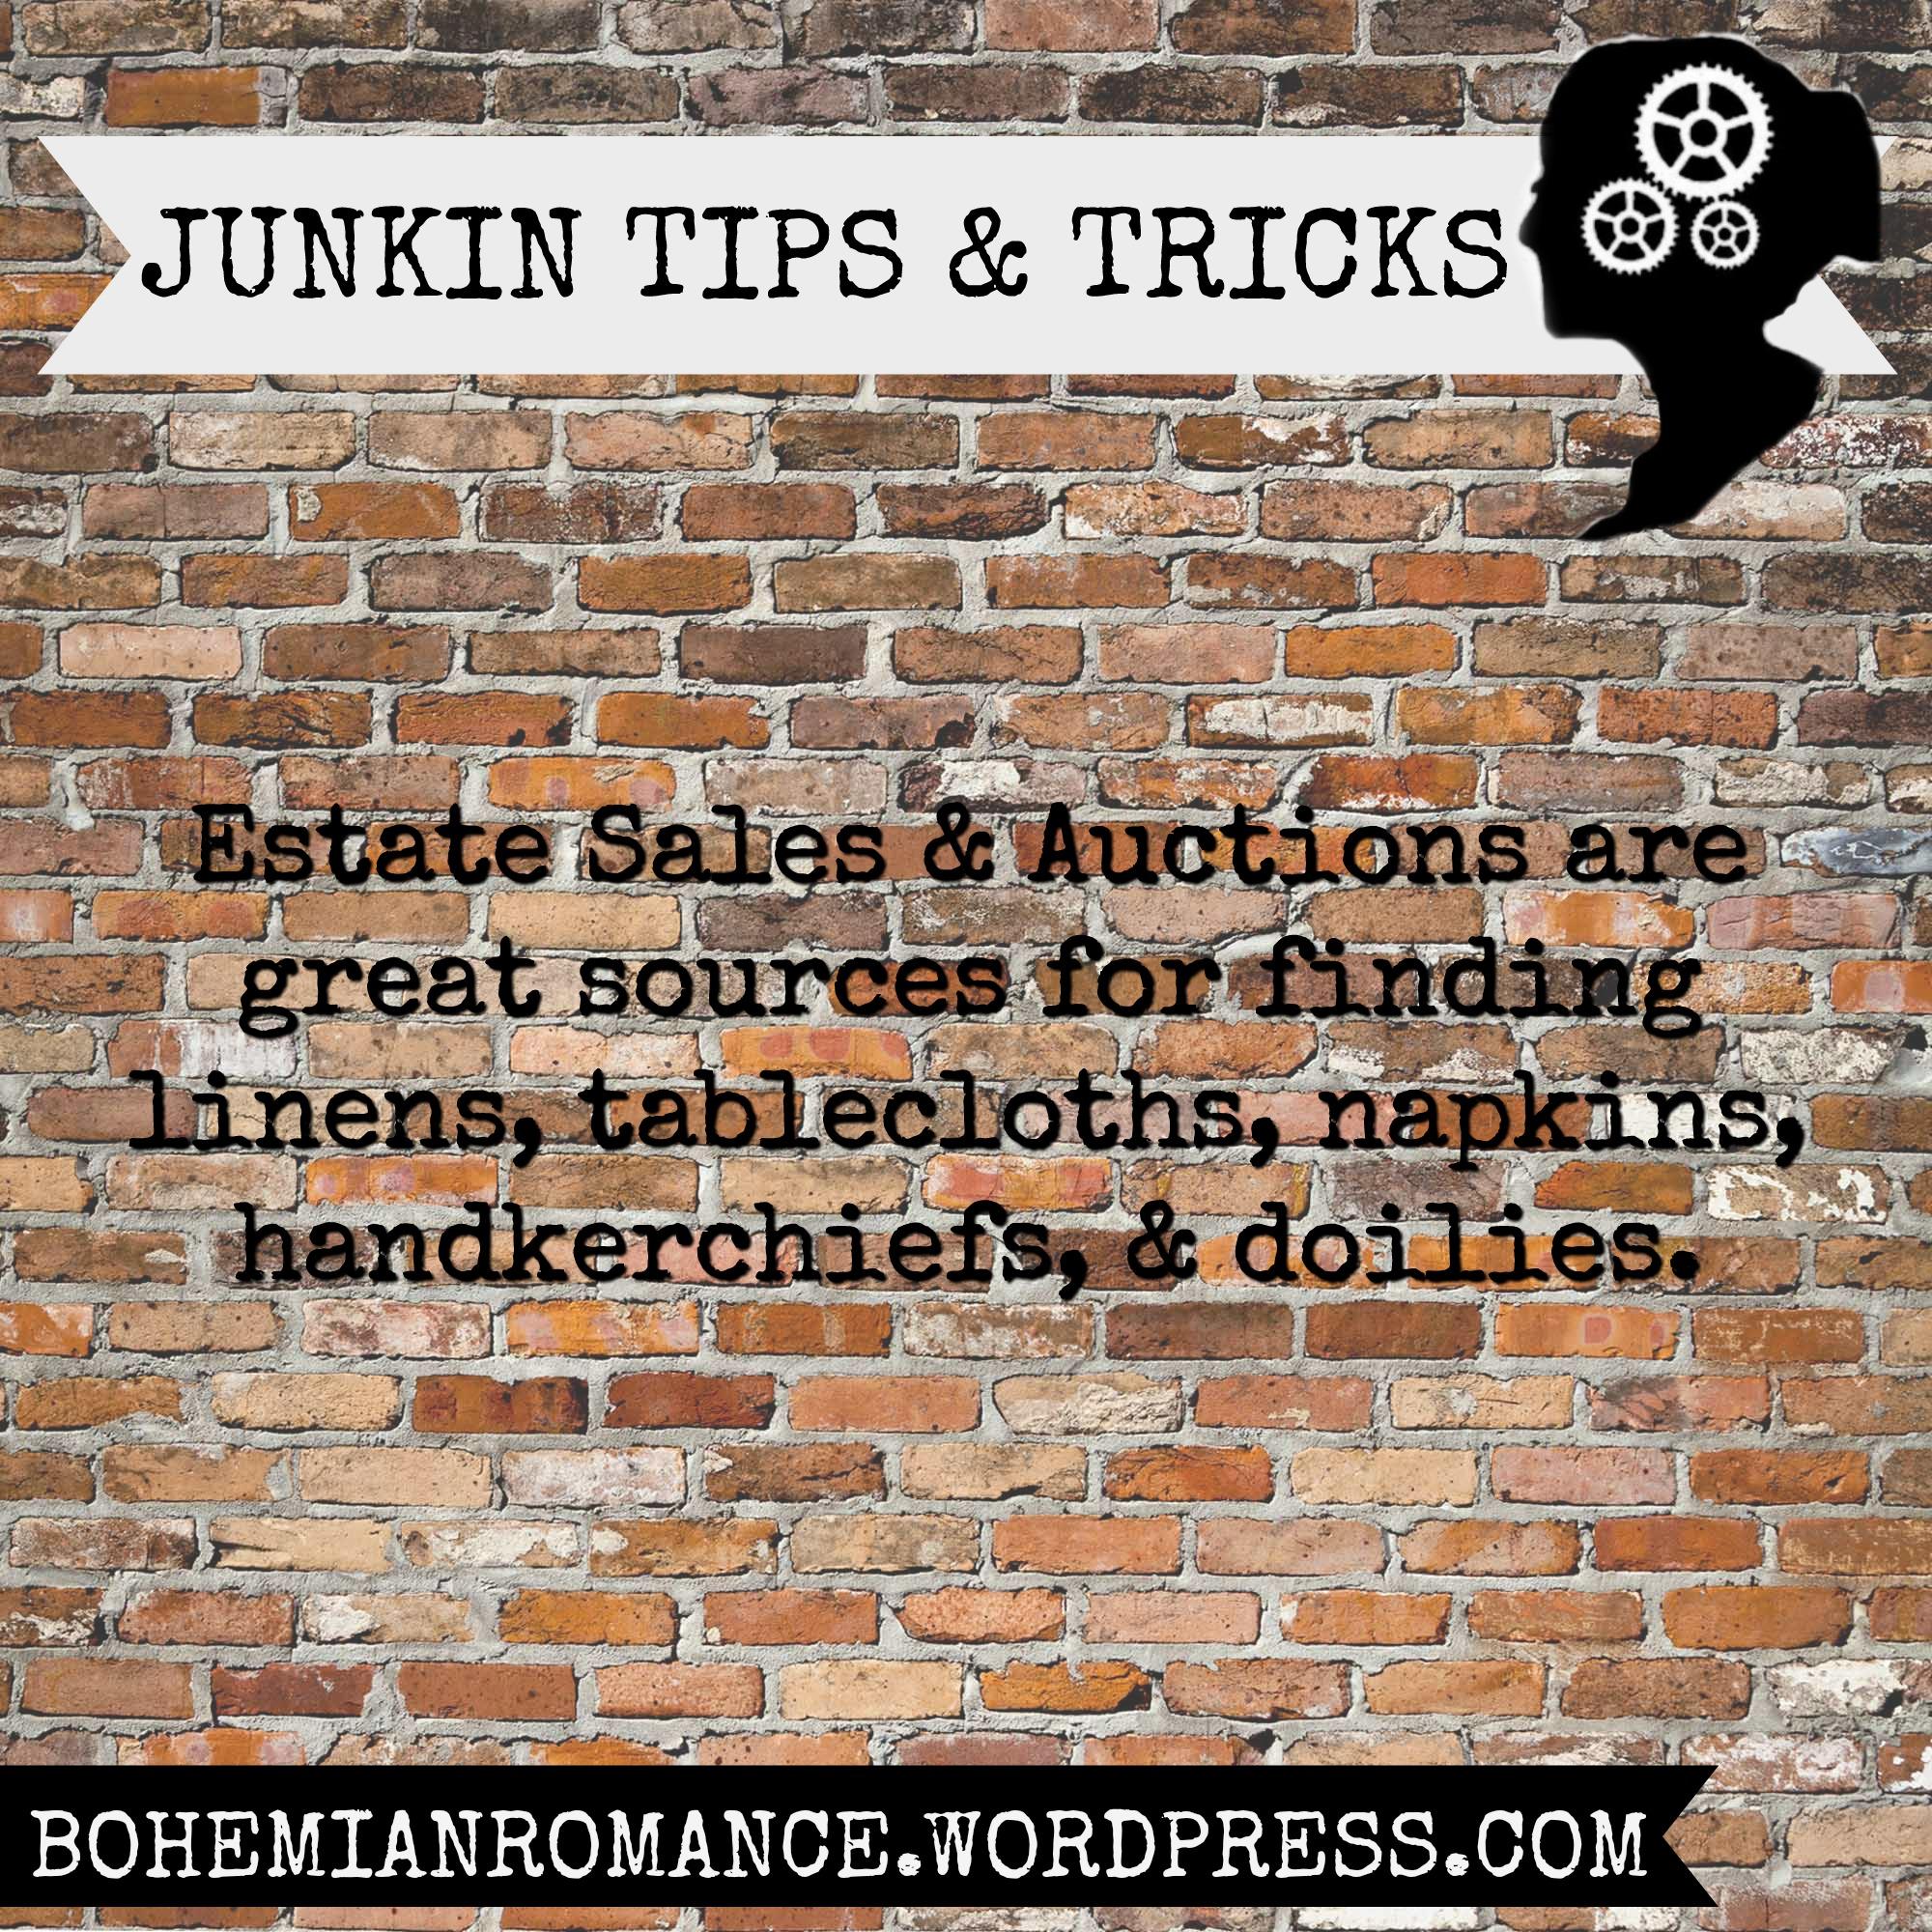 12-junkin-tips-tricks-template